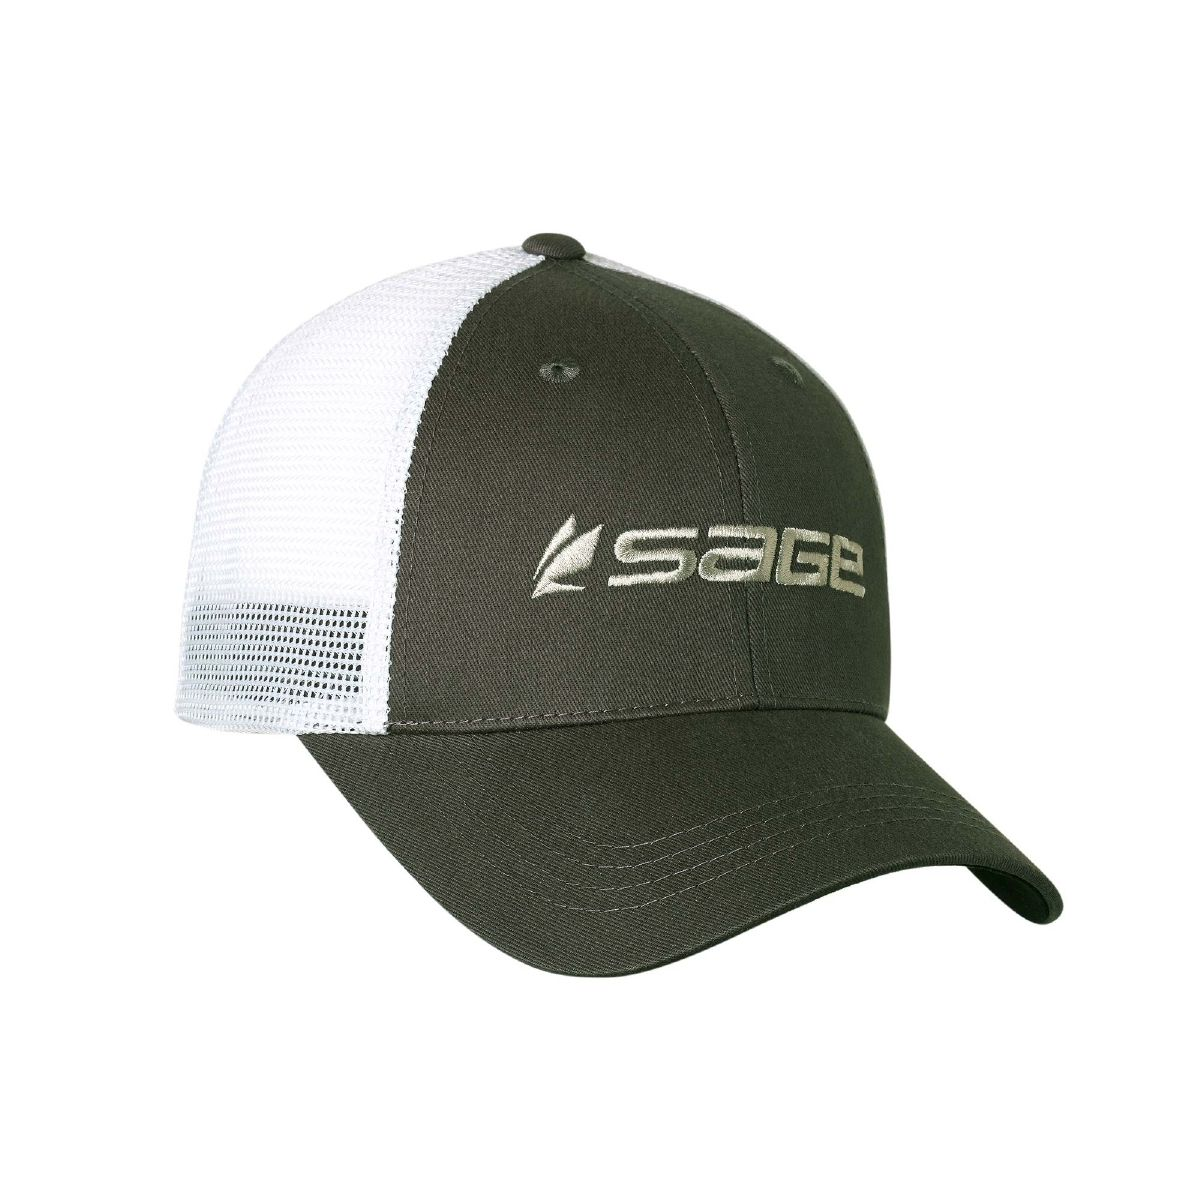 Sage Fly Fishing Mesh Back Trucker Cap Hat